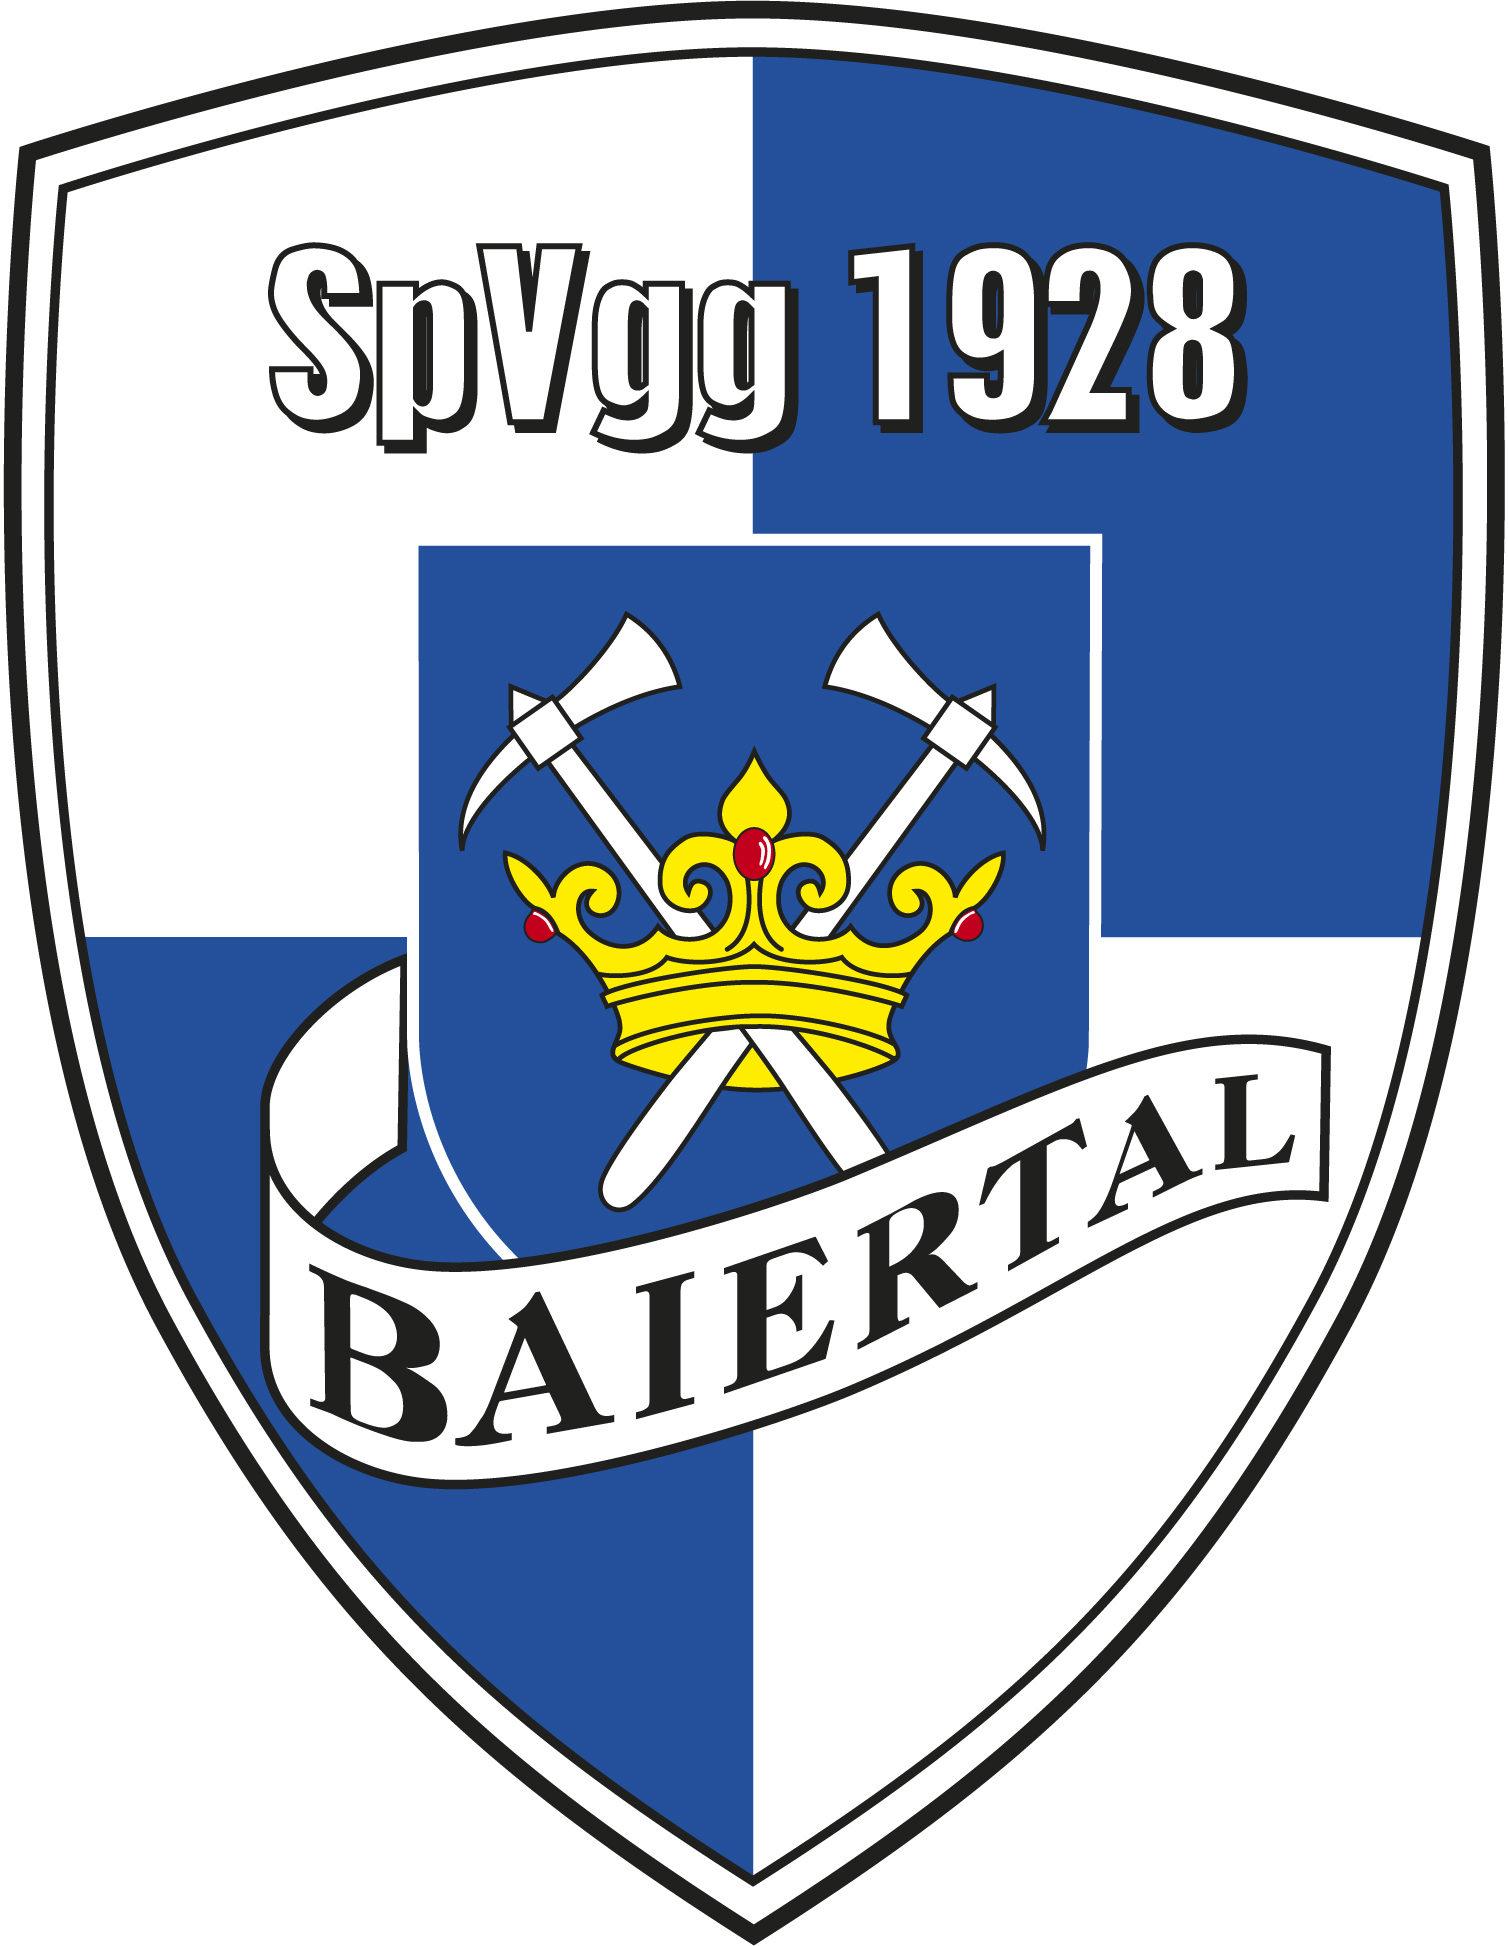 SpVgg Baiertal